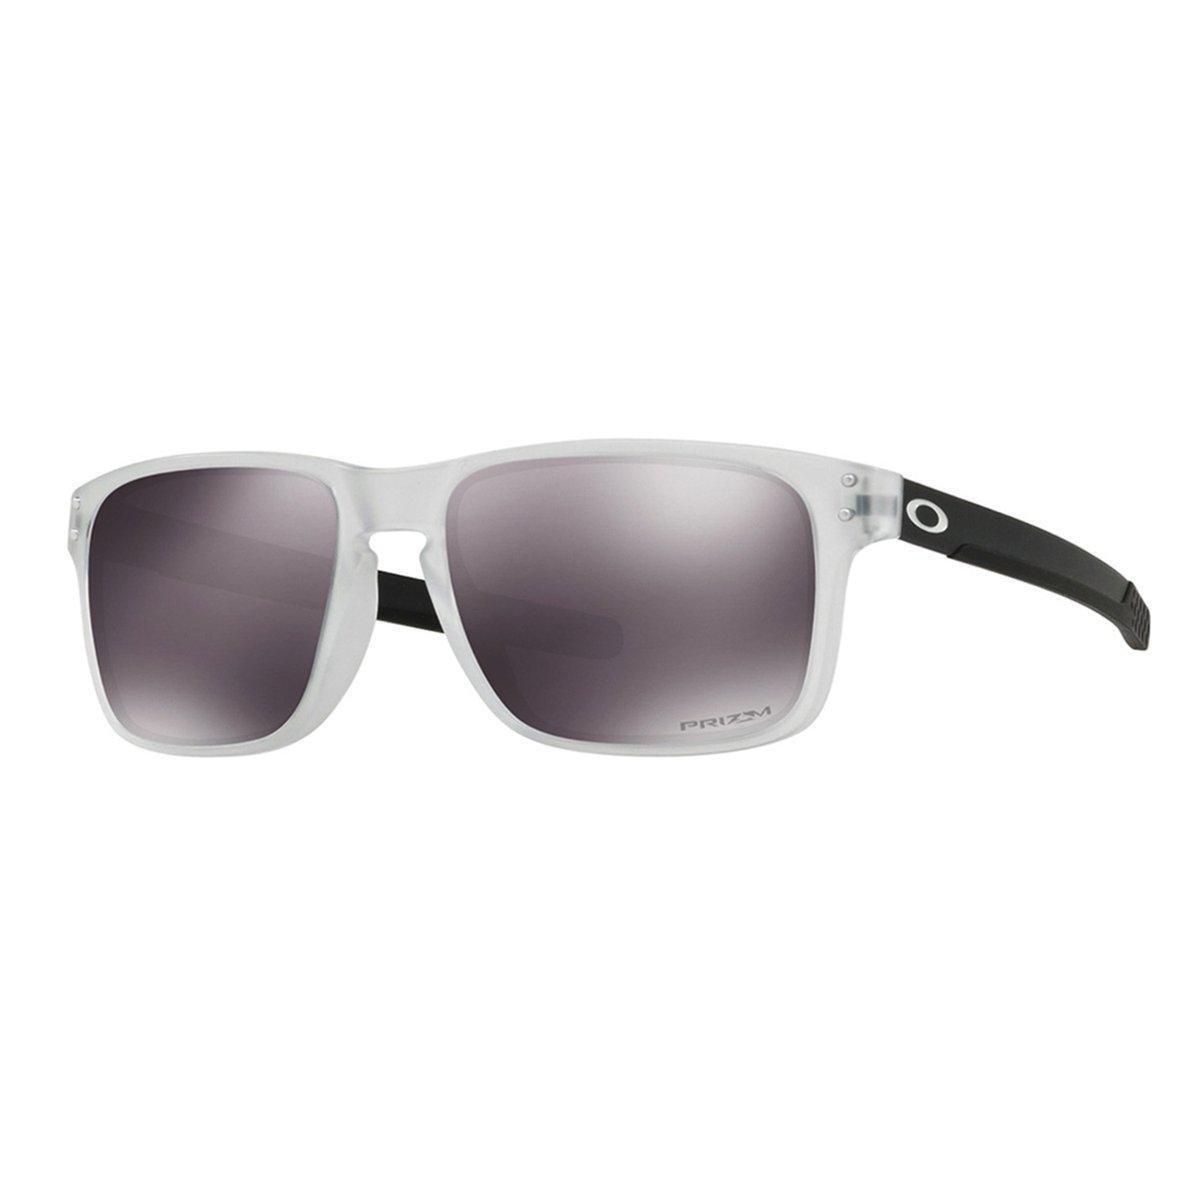 428443ca18f66 Óculos Oakley Holbrook Mix - Compre Agora